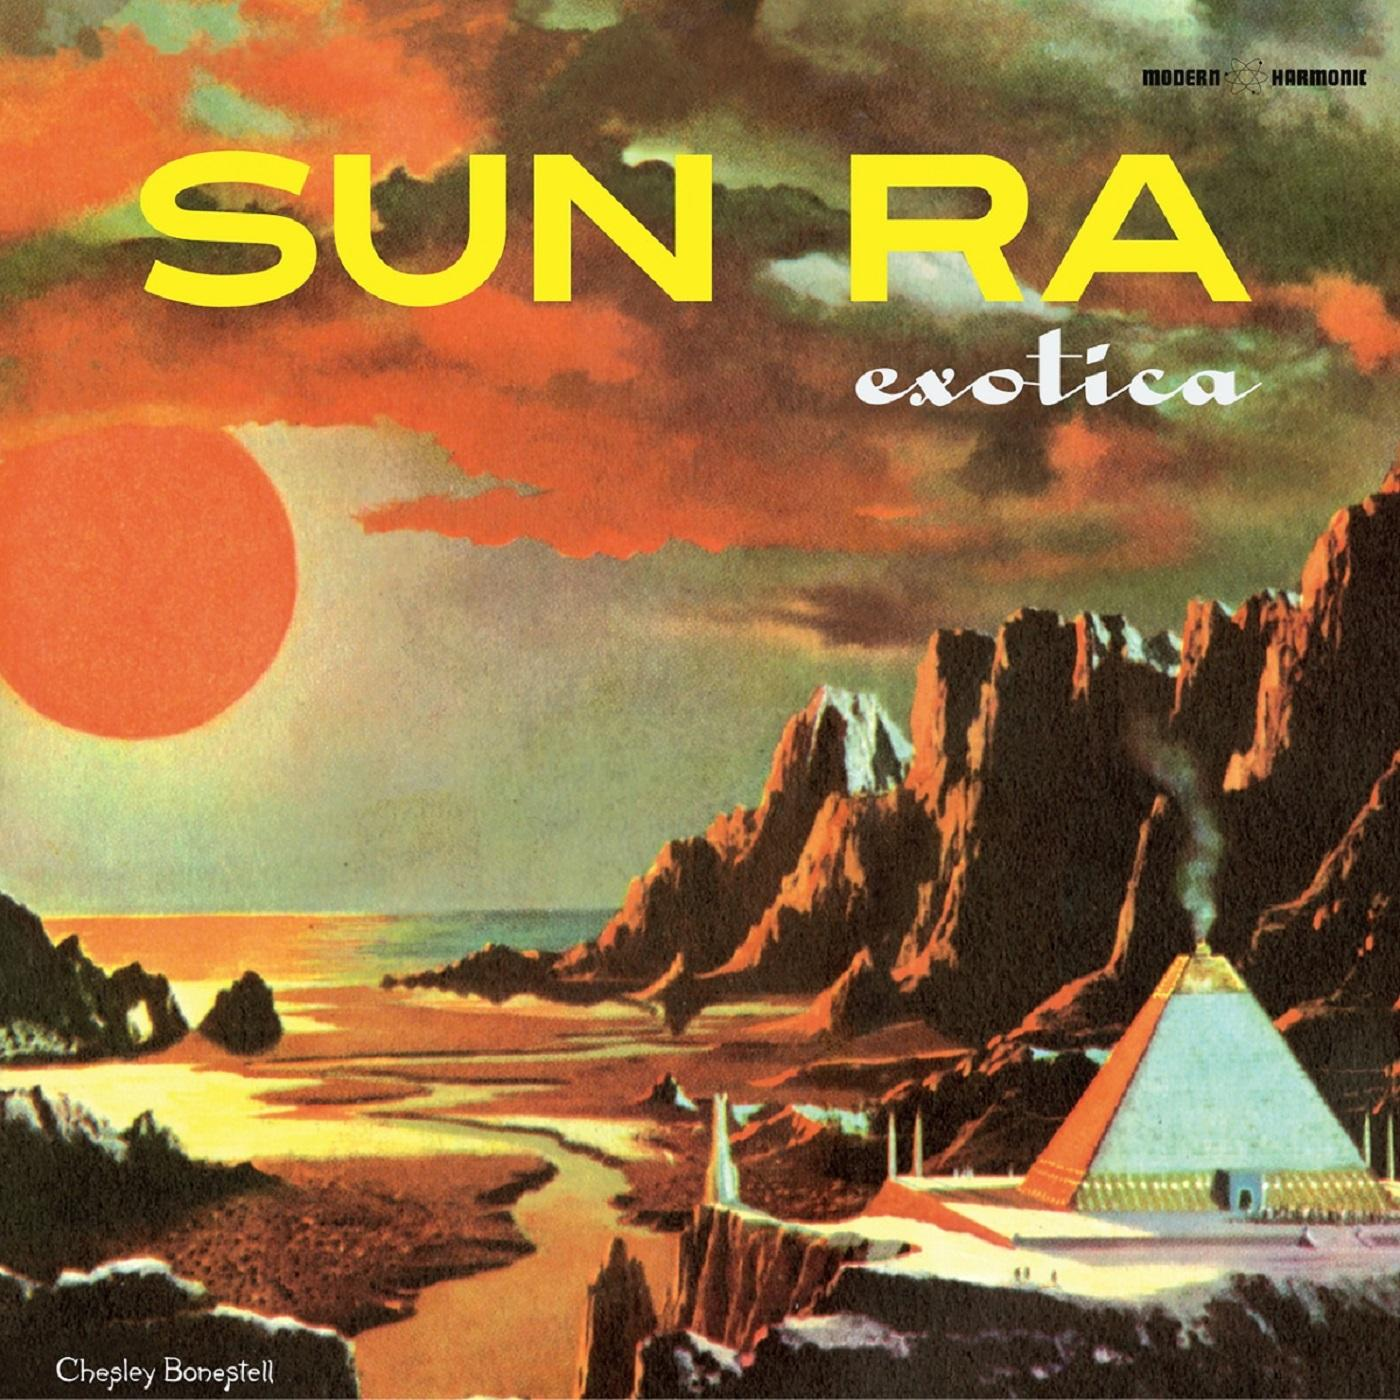 Sun Ra - Exotica - 3-LP Set